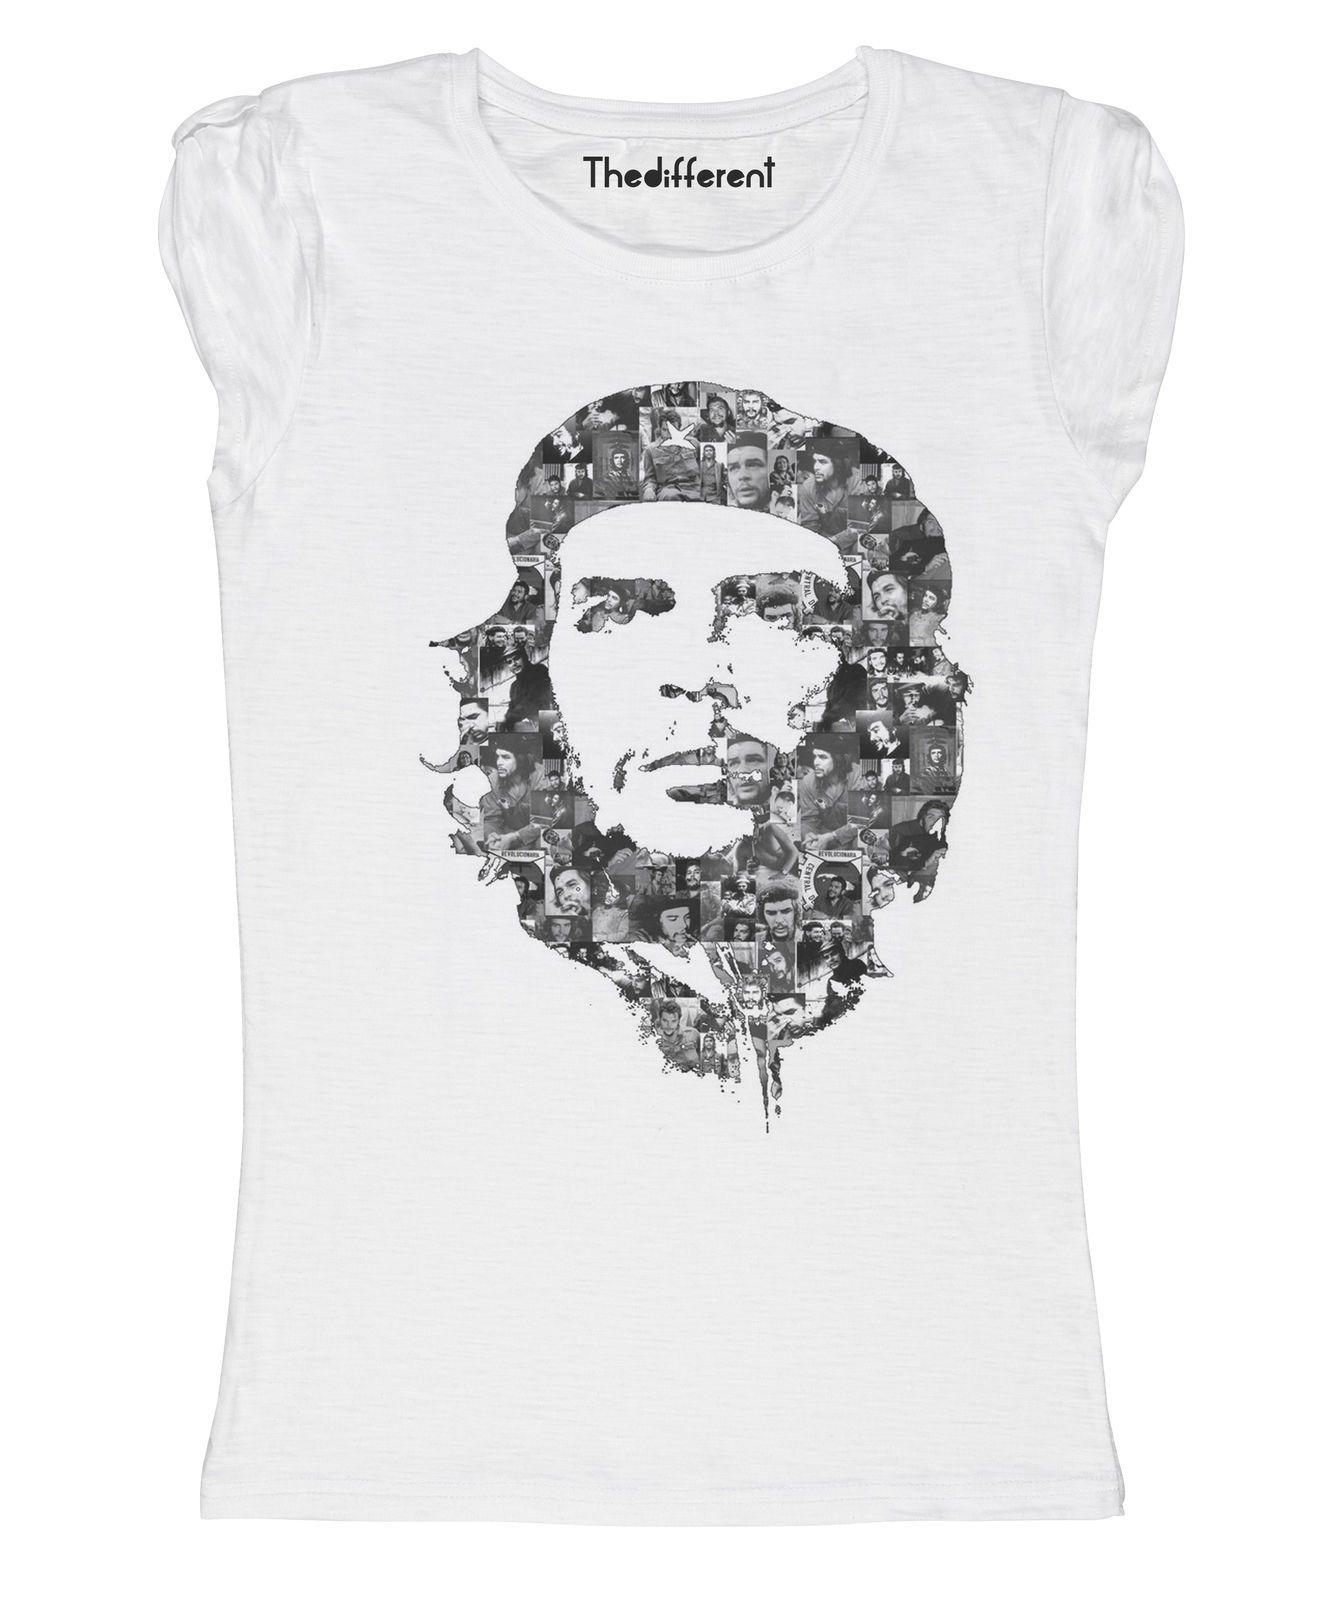 a8c530a9e New Women'S T Shirt Blaze Che Guevara Multi Photo Gift Idea All T Shirt  Order Tee Shirts From Bincheng2, $11.56| DHgate.Com